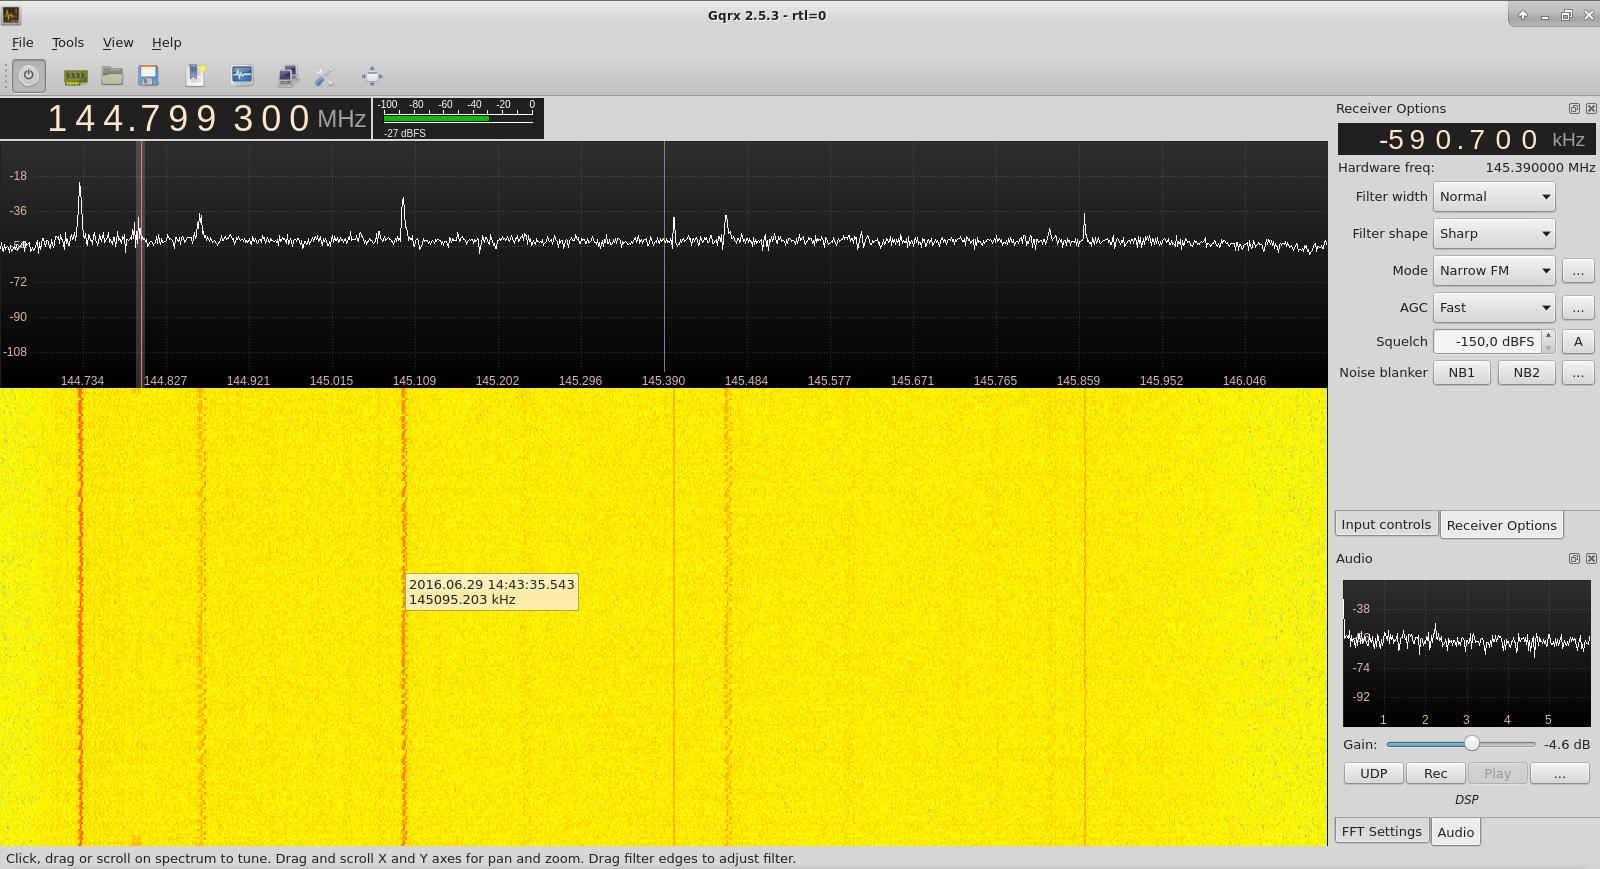 Gqrx 2.11.5 SDR unter Linux UPDATE